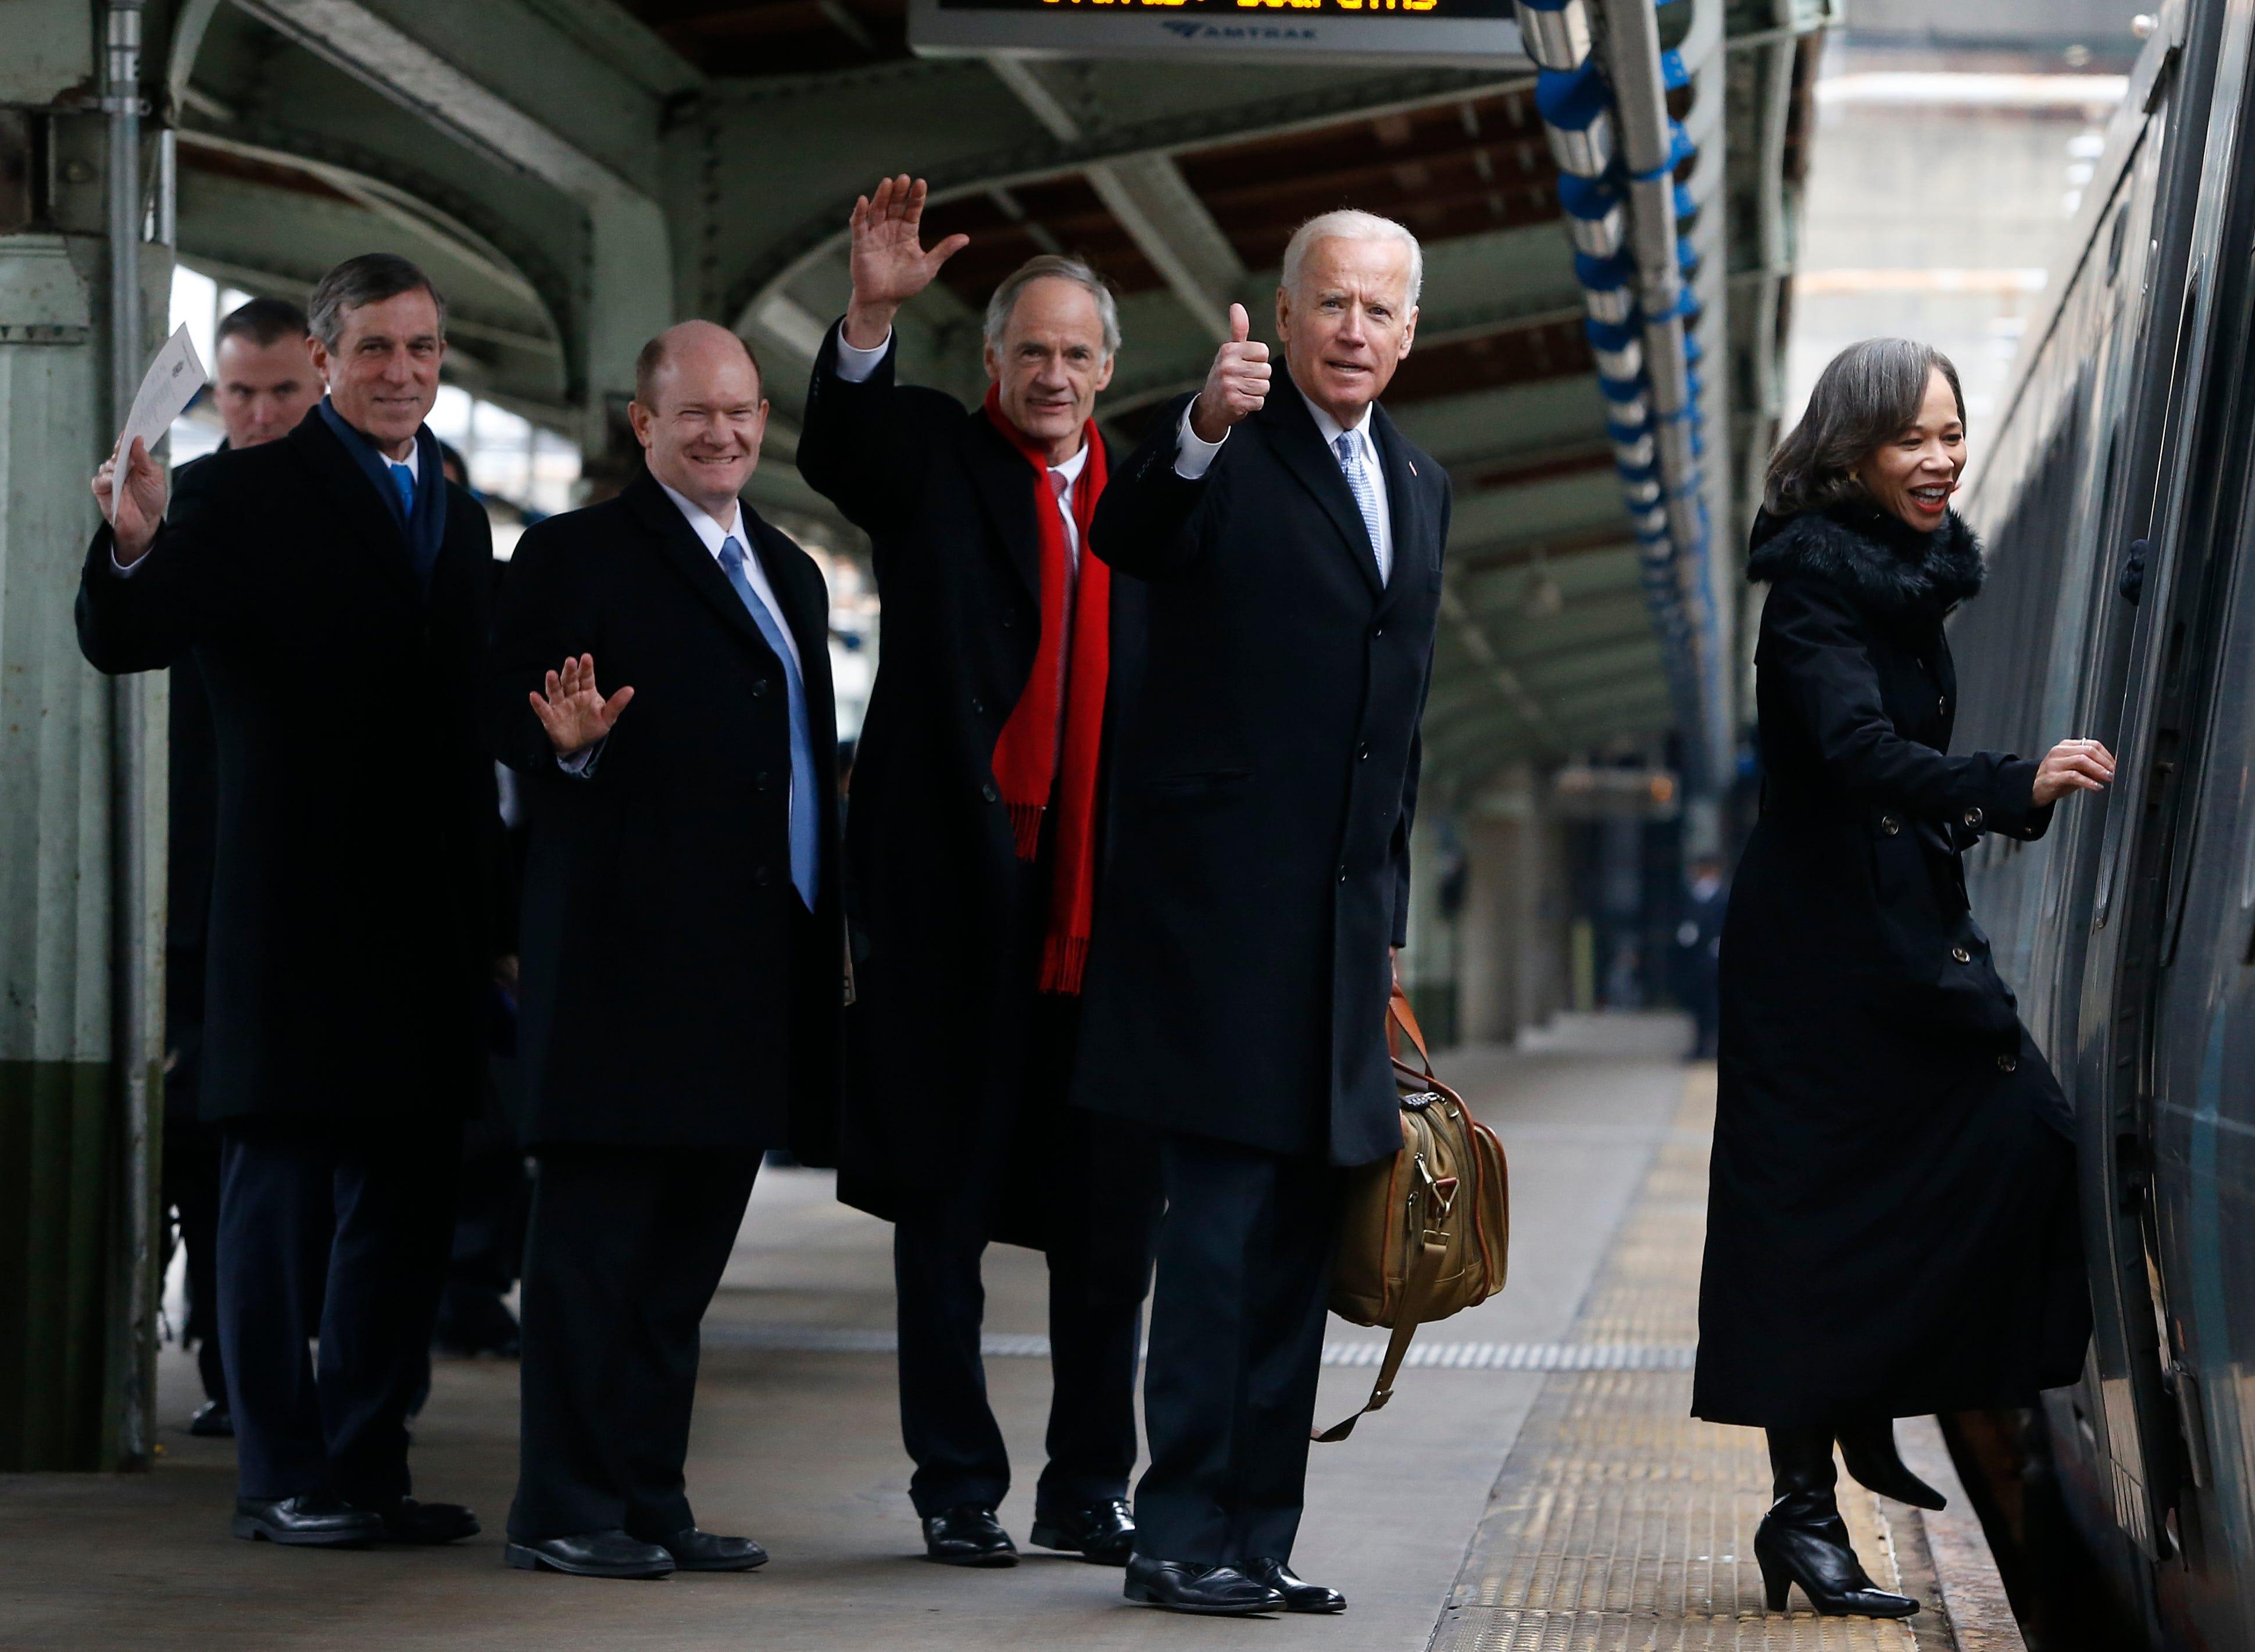 Joe Biden: From Scranton to vice president and beyond